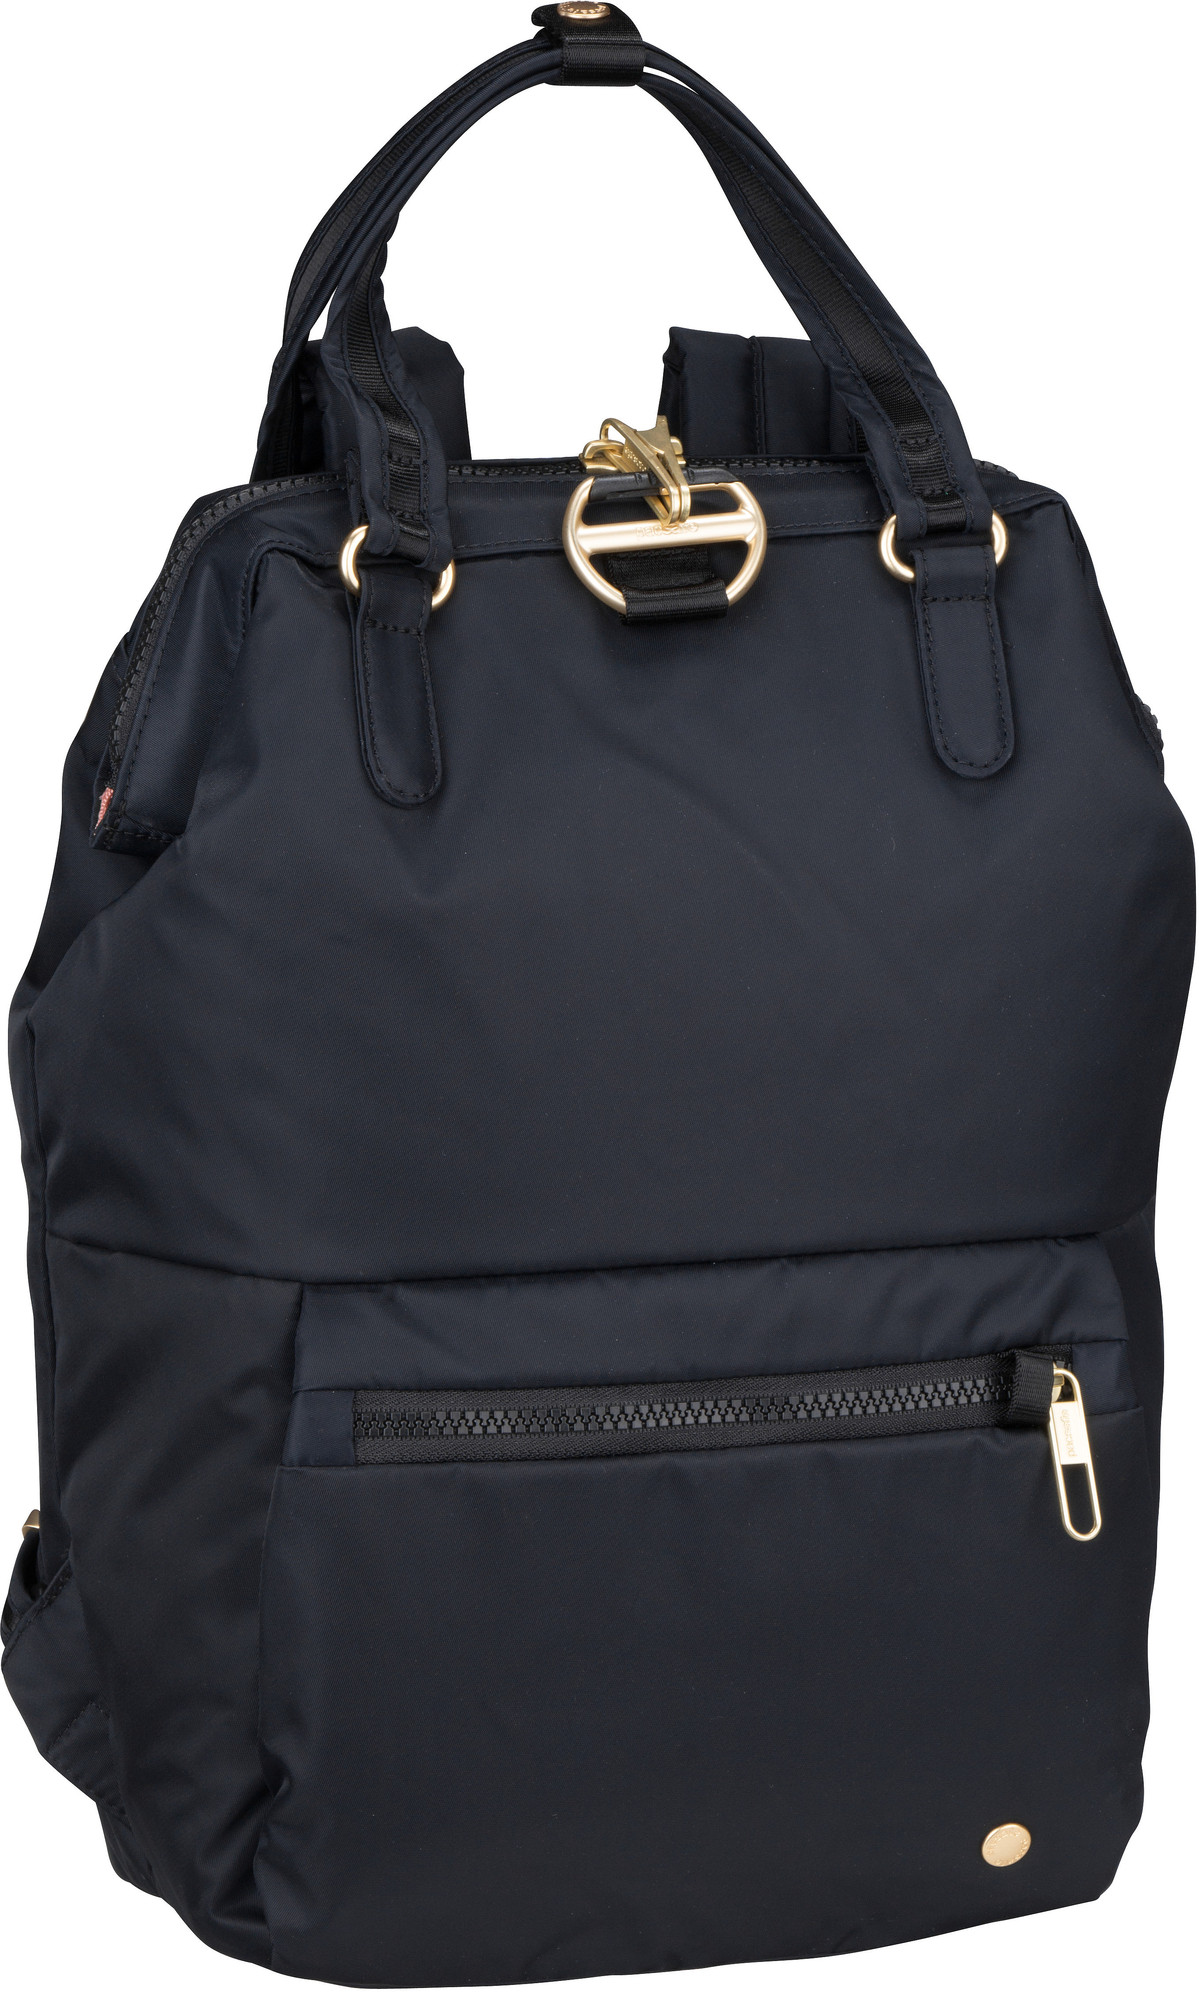 Rucksack / Daypack Citysafe CX Mini Backpack Black (11 Liter)